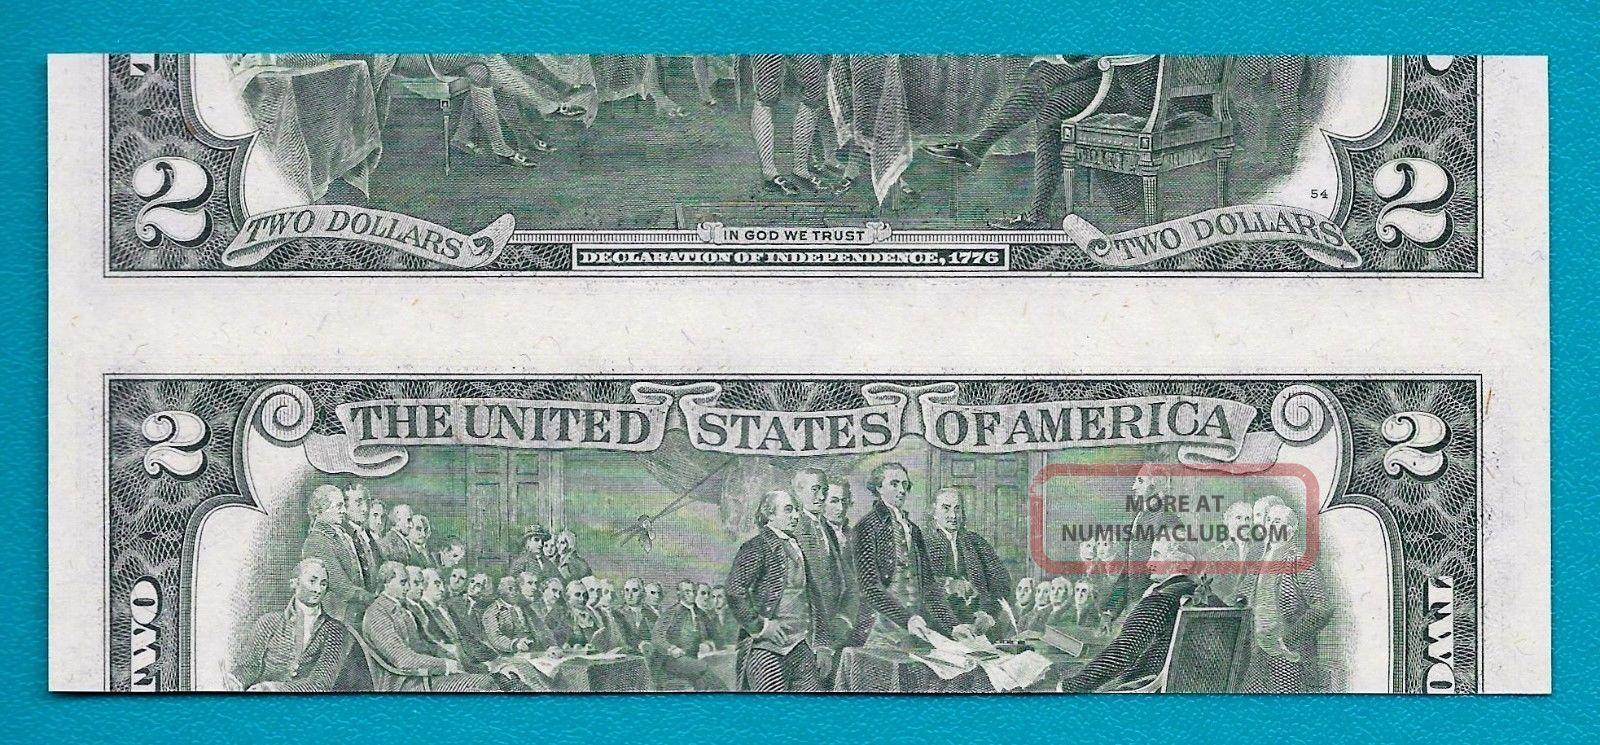 Gem $2 Star Note 1976